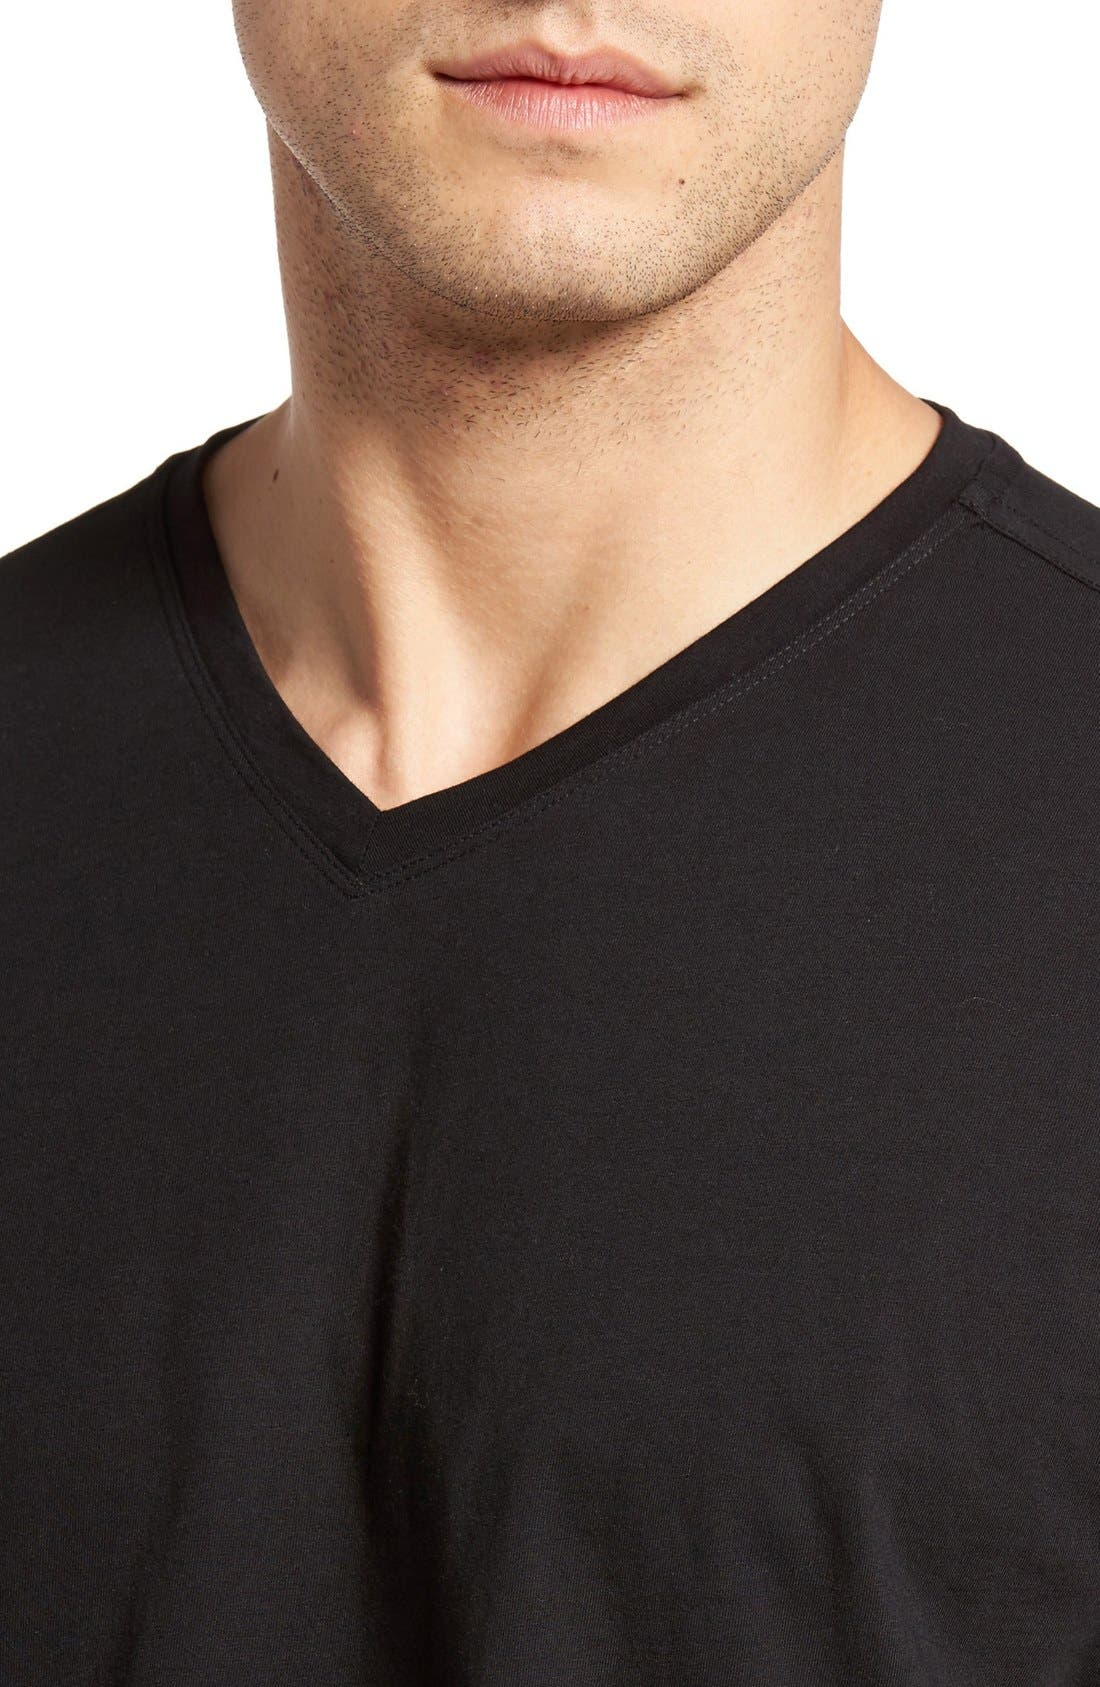 Alternate Image 4  - Cutter & Buck 'Sida' V-Neck T-Shirt (Big & Tall)